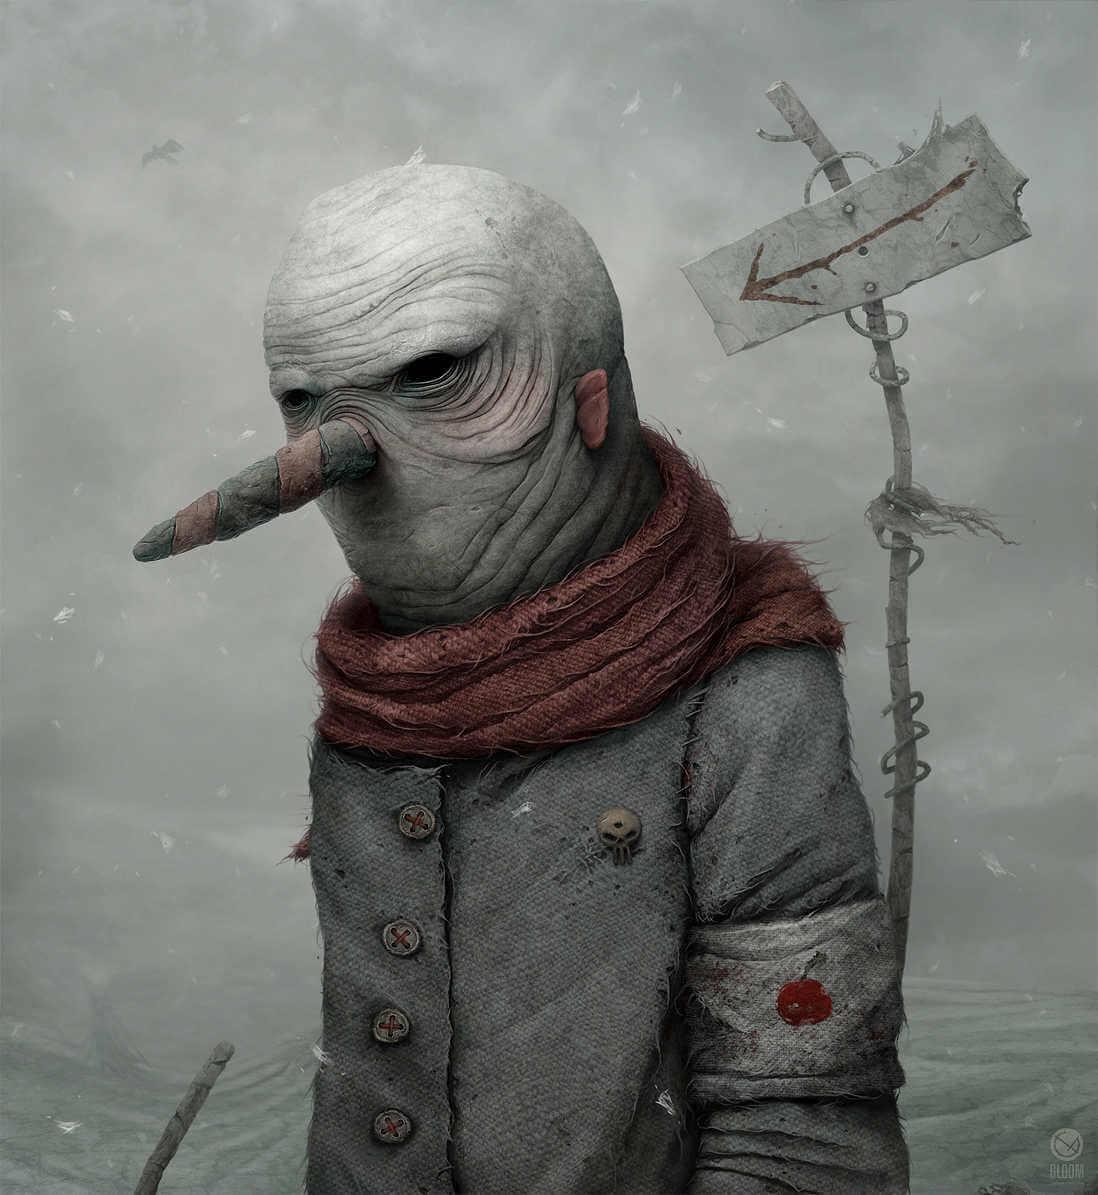 Dibujo de personaje grotesco